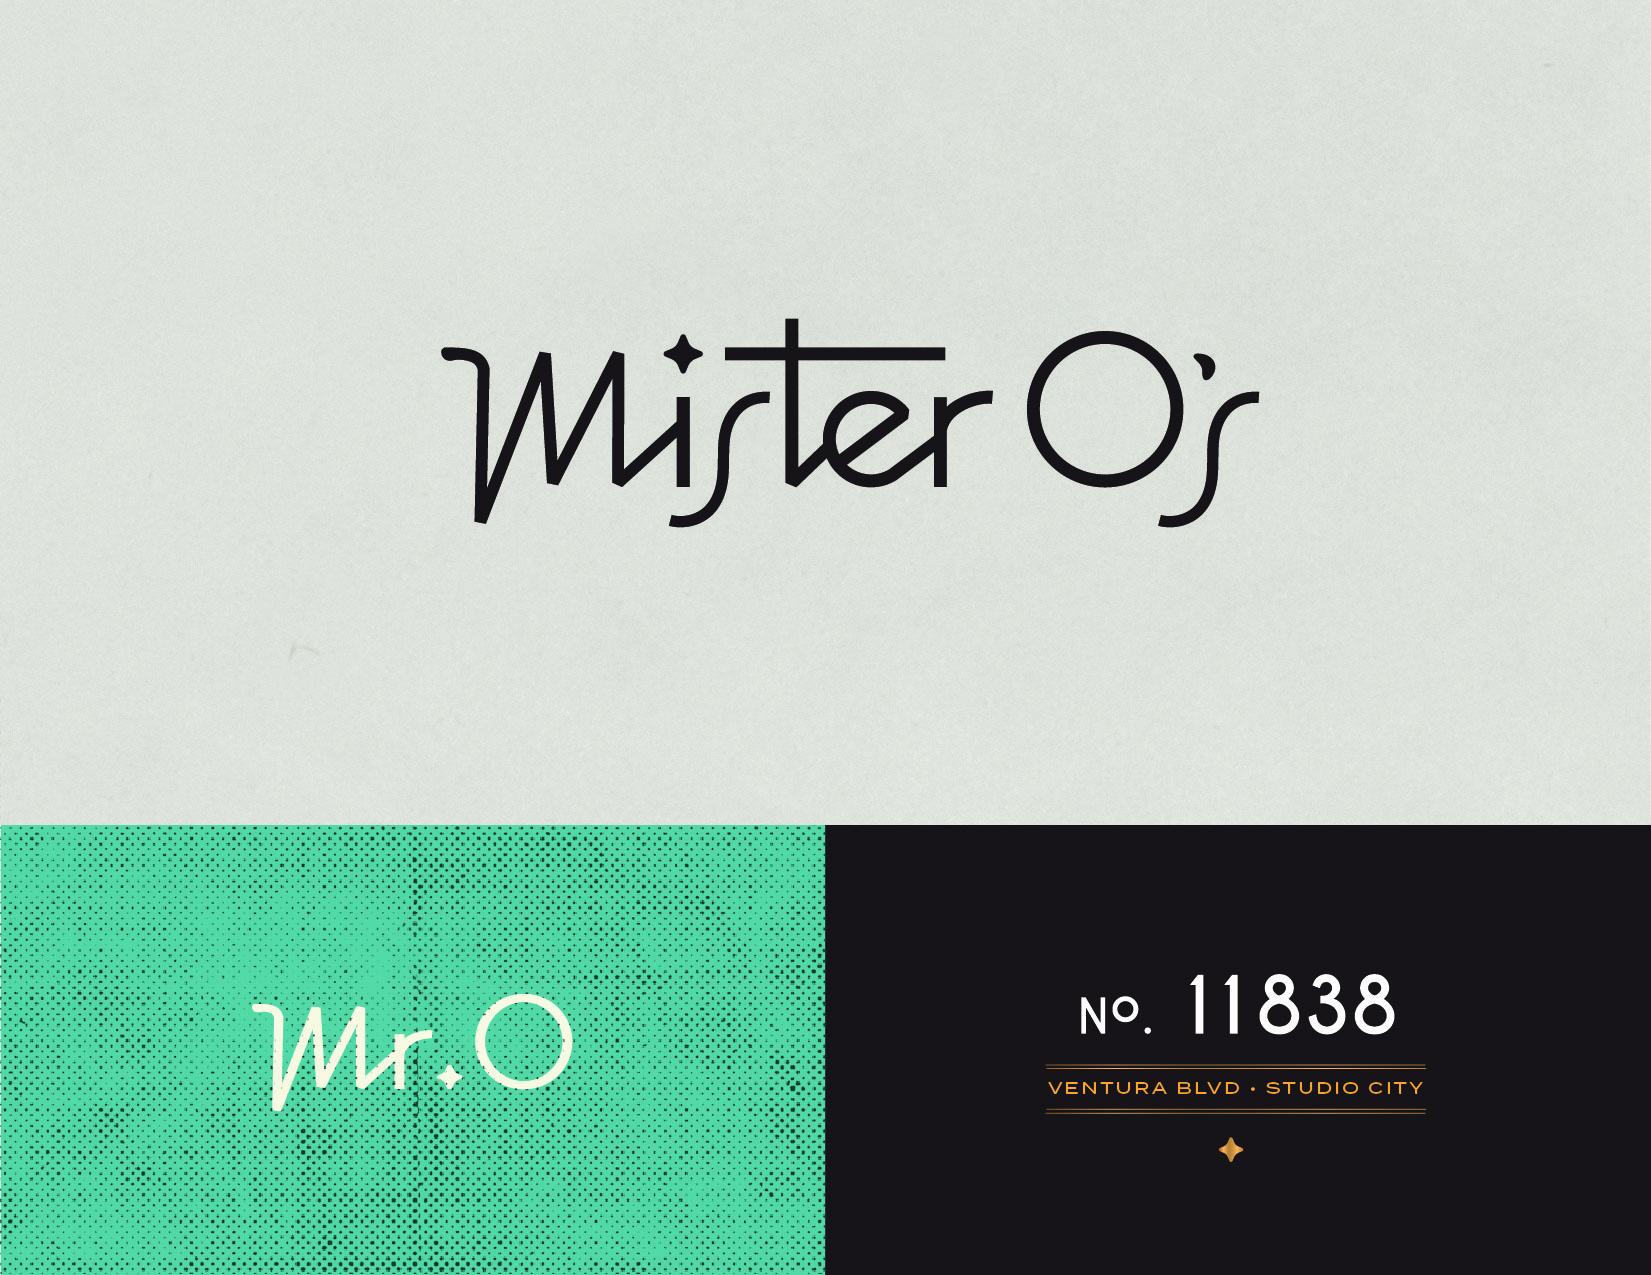 MisterO's_Concept1_MS-01.jpg